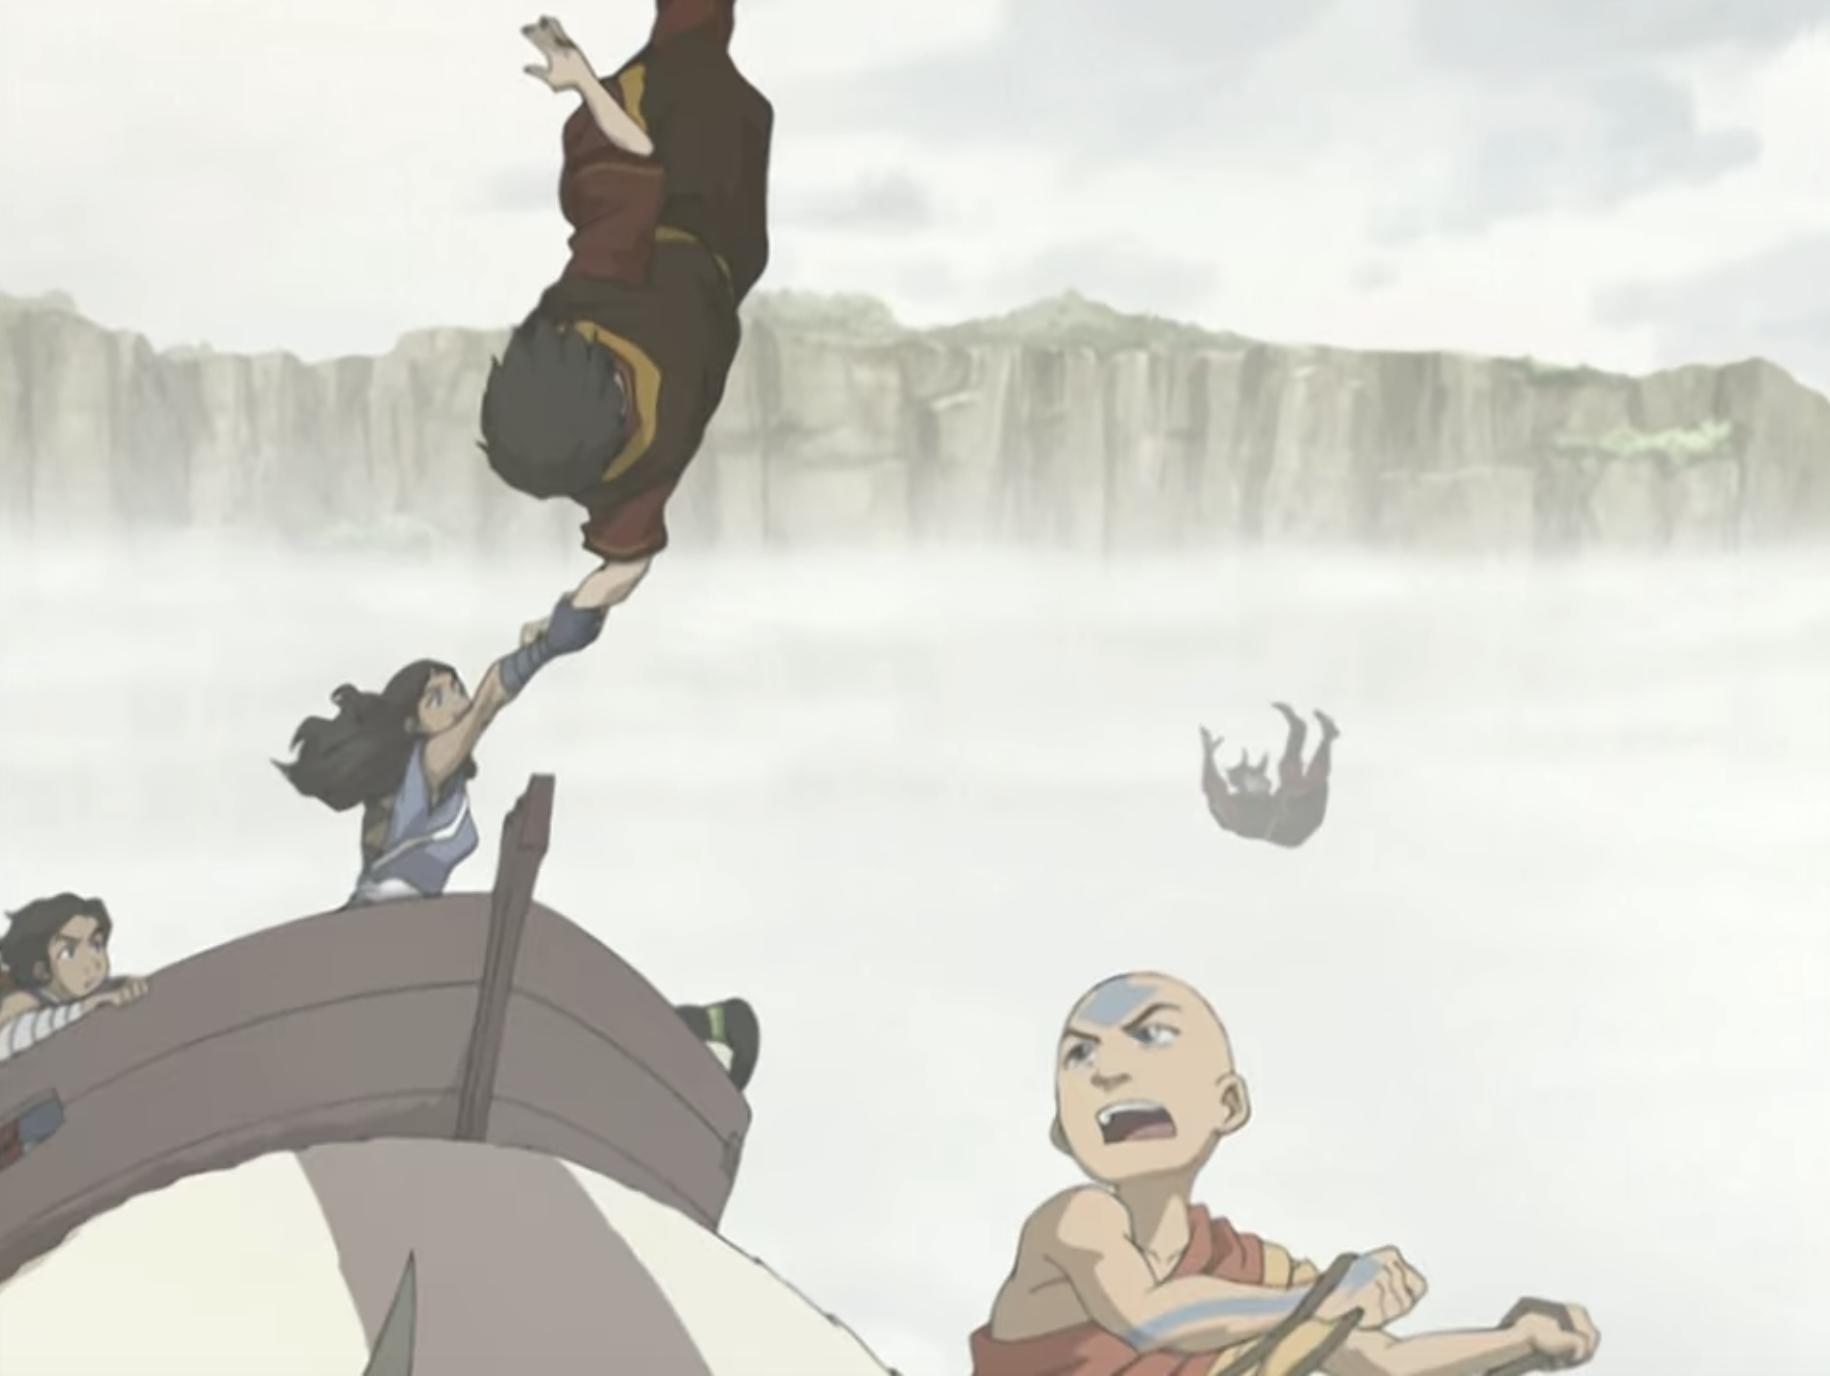 Katara grabbing Zuko's hand and saving him from falling to his death.